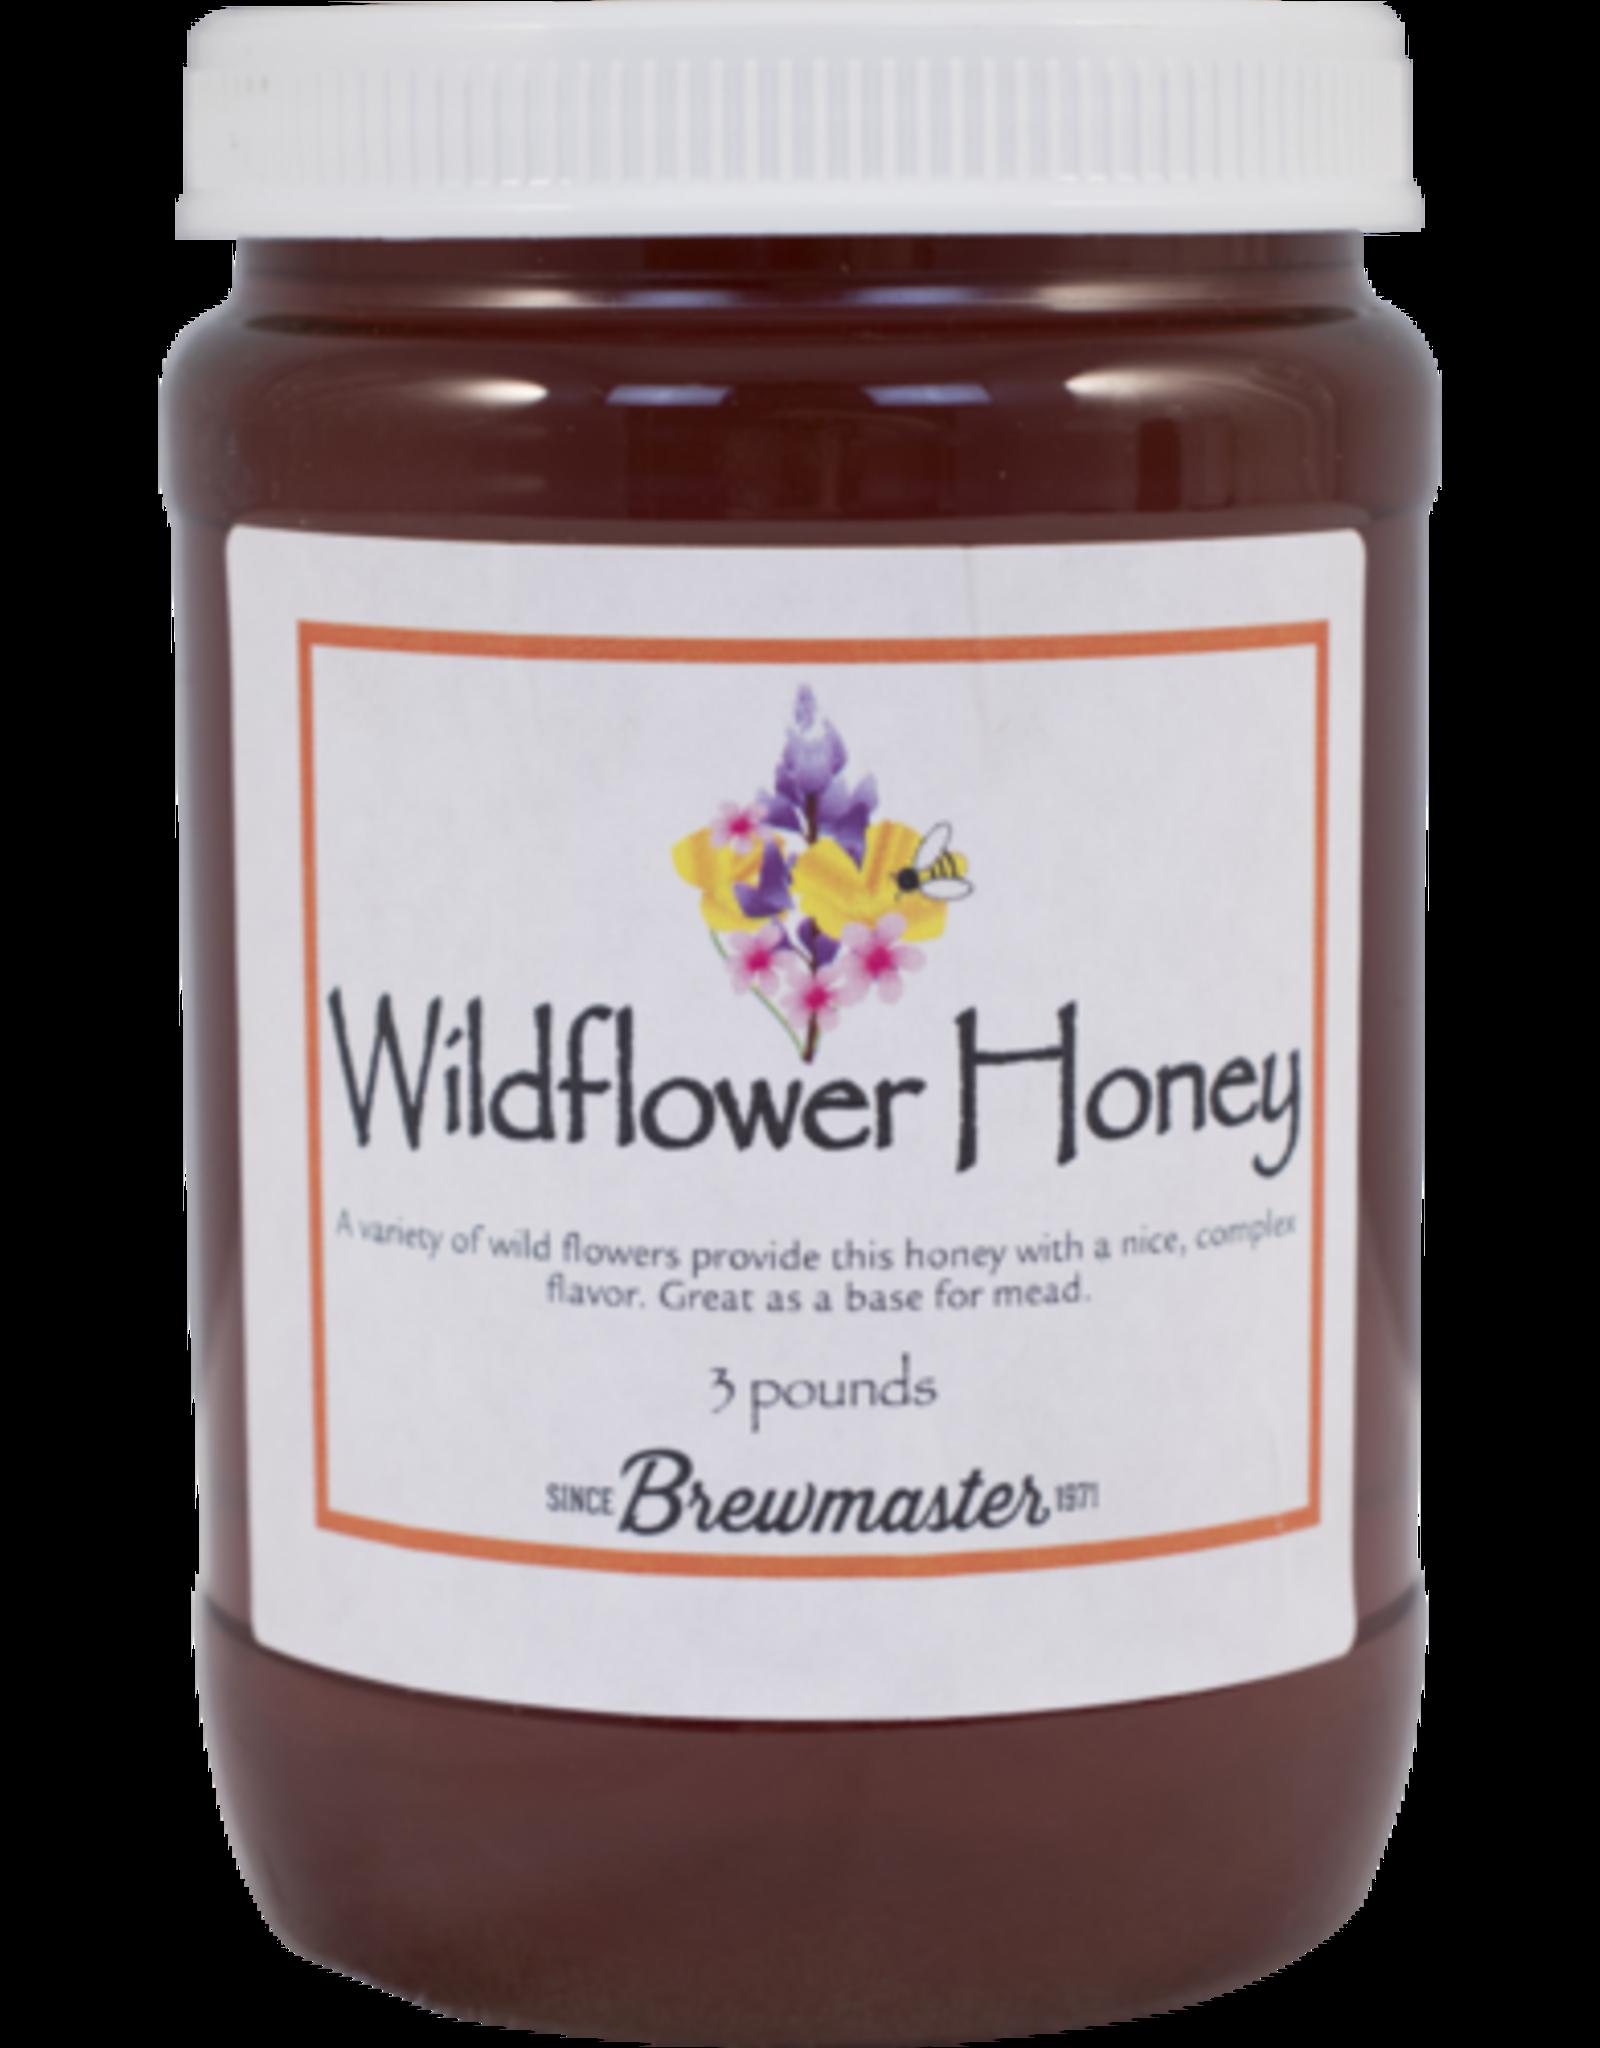 WILDFLOWER HONEY 3lb JAR